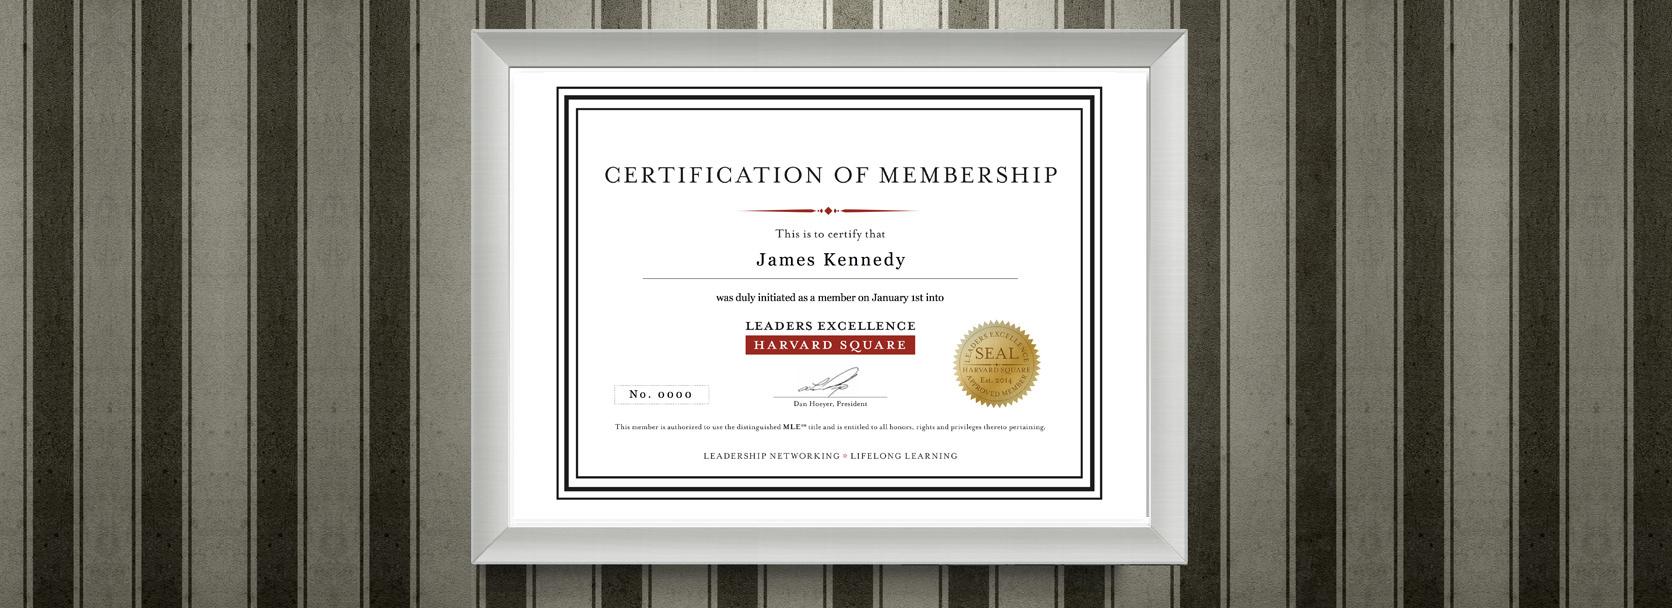 Frameable membership certificate